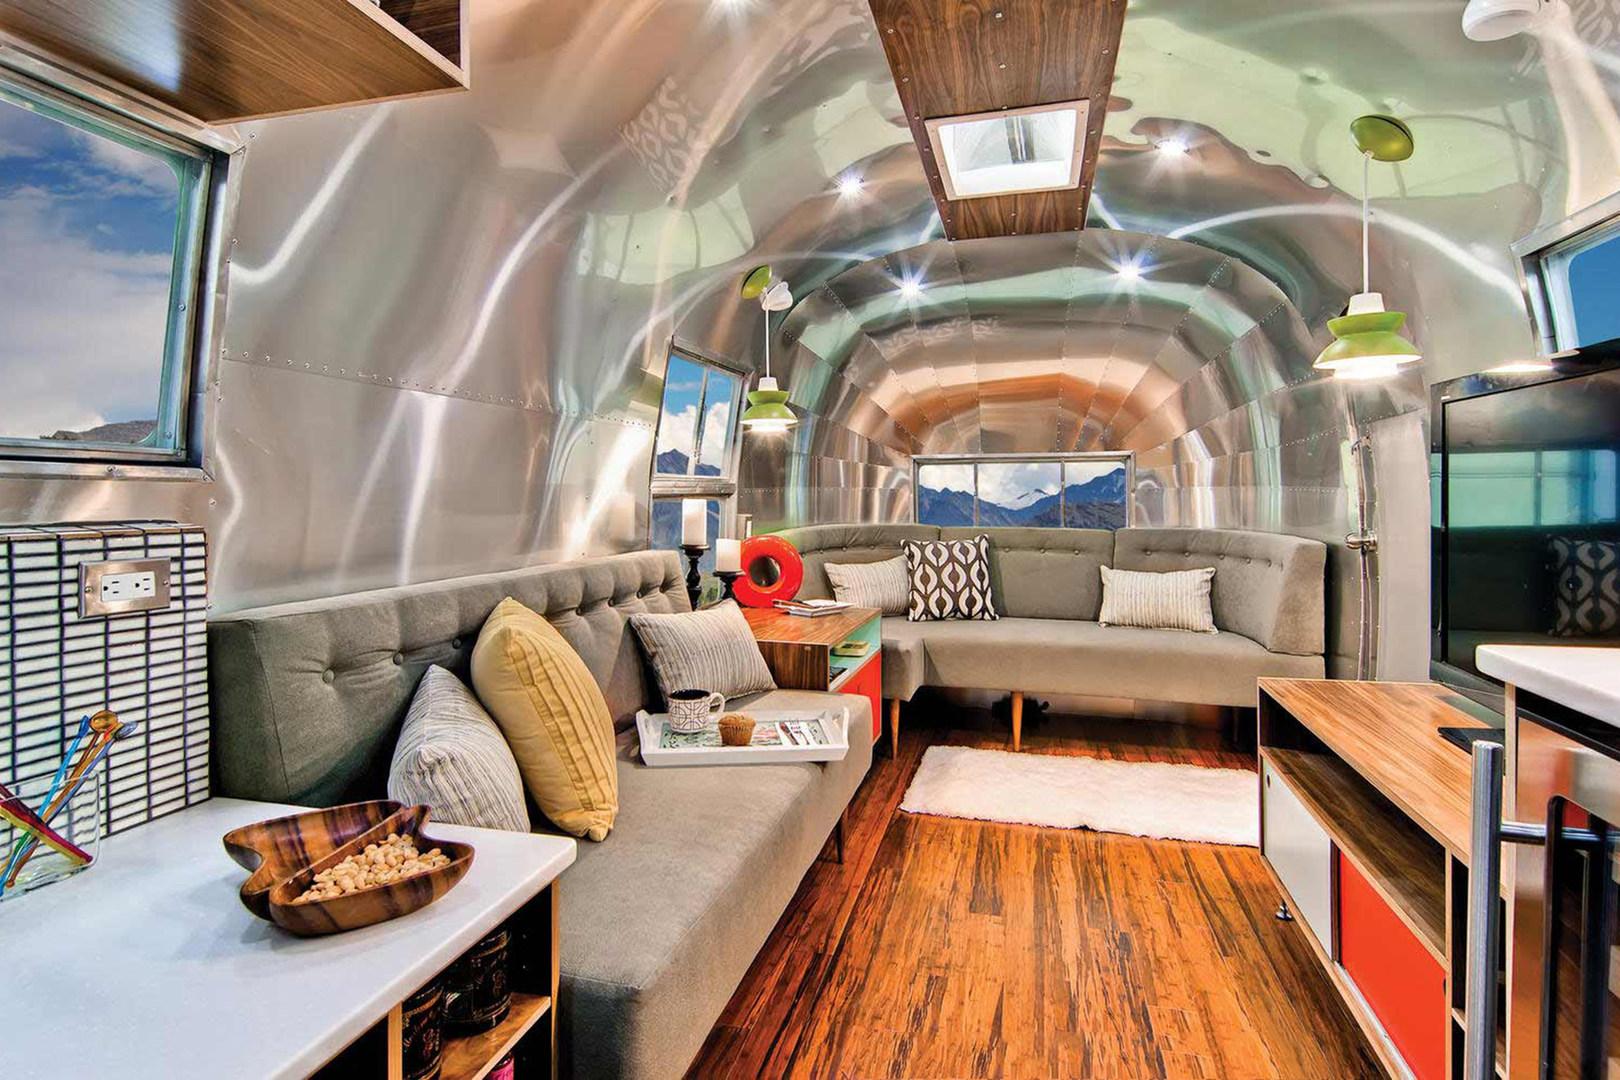 The Best Camper Vans Trailers Outdoor Project